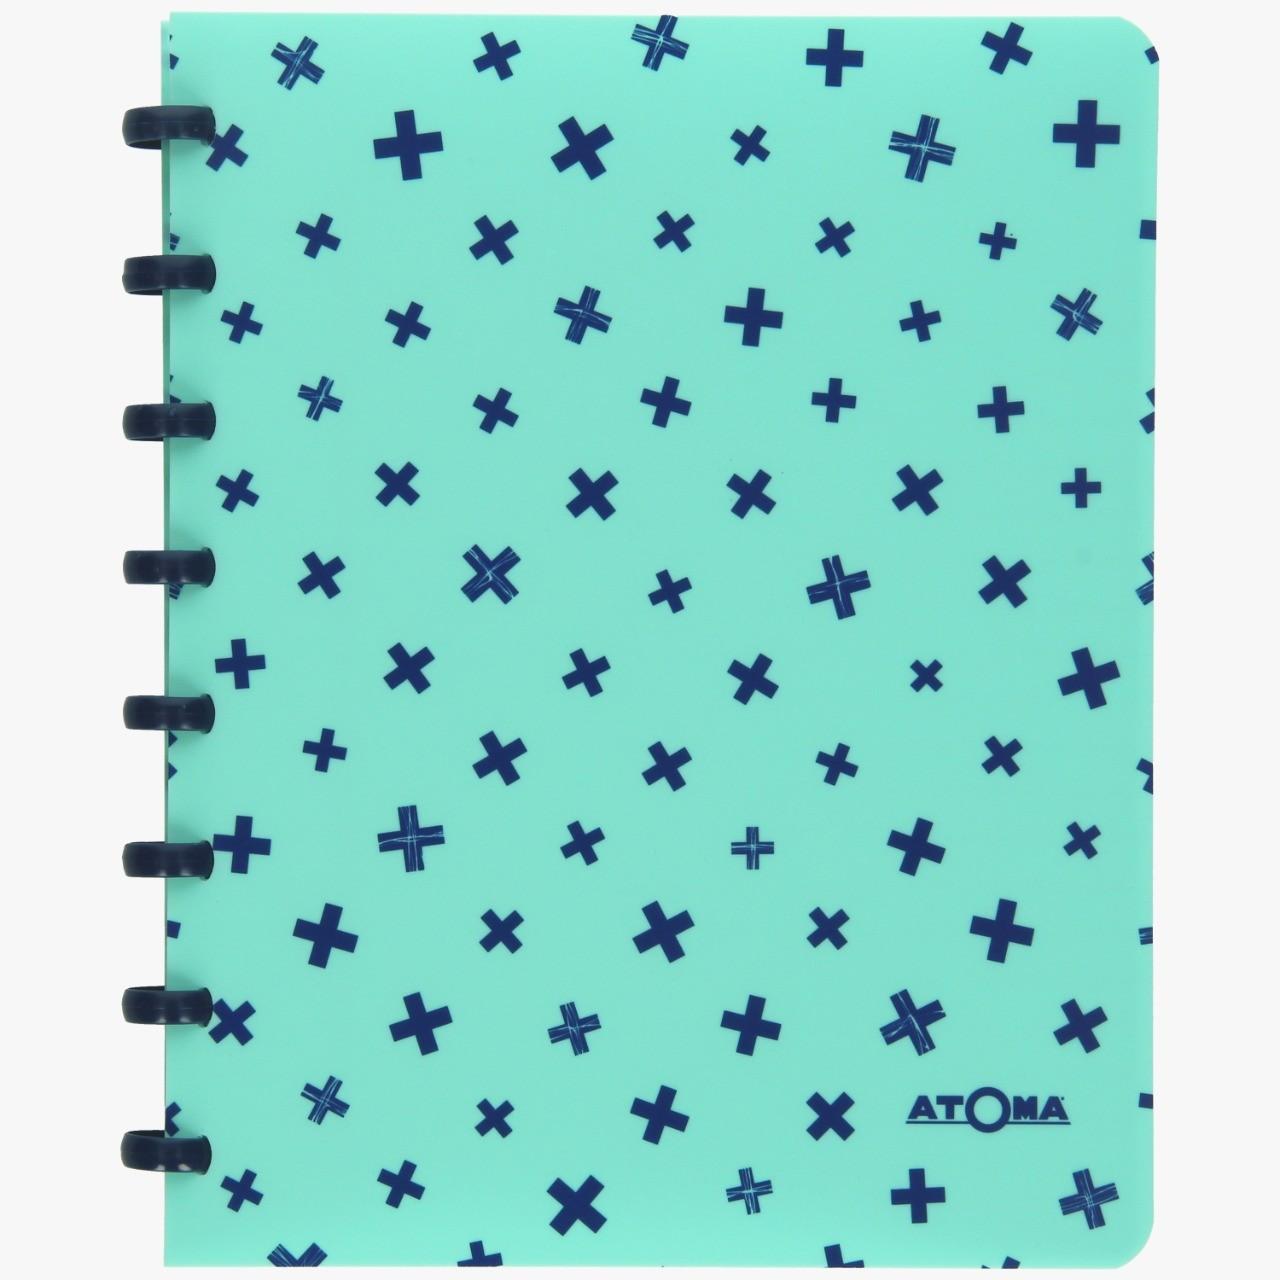 Caderno ATOMA Pastel - A5 Branco Pautado c/ 72 folhas